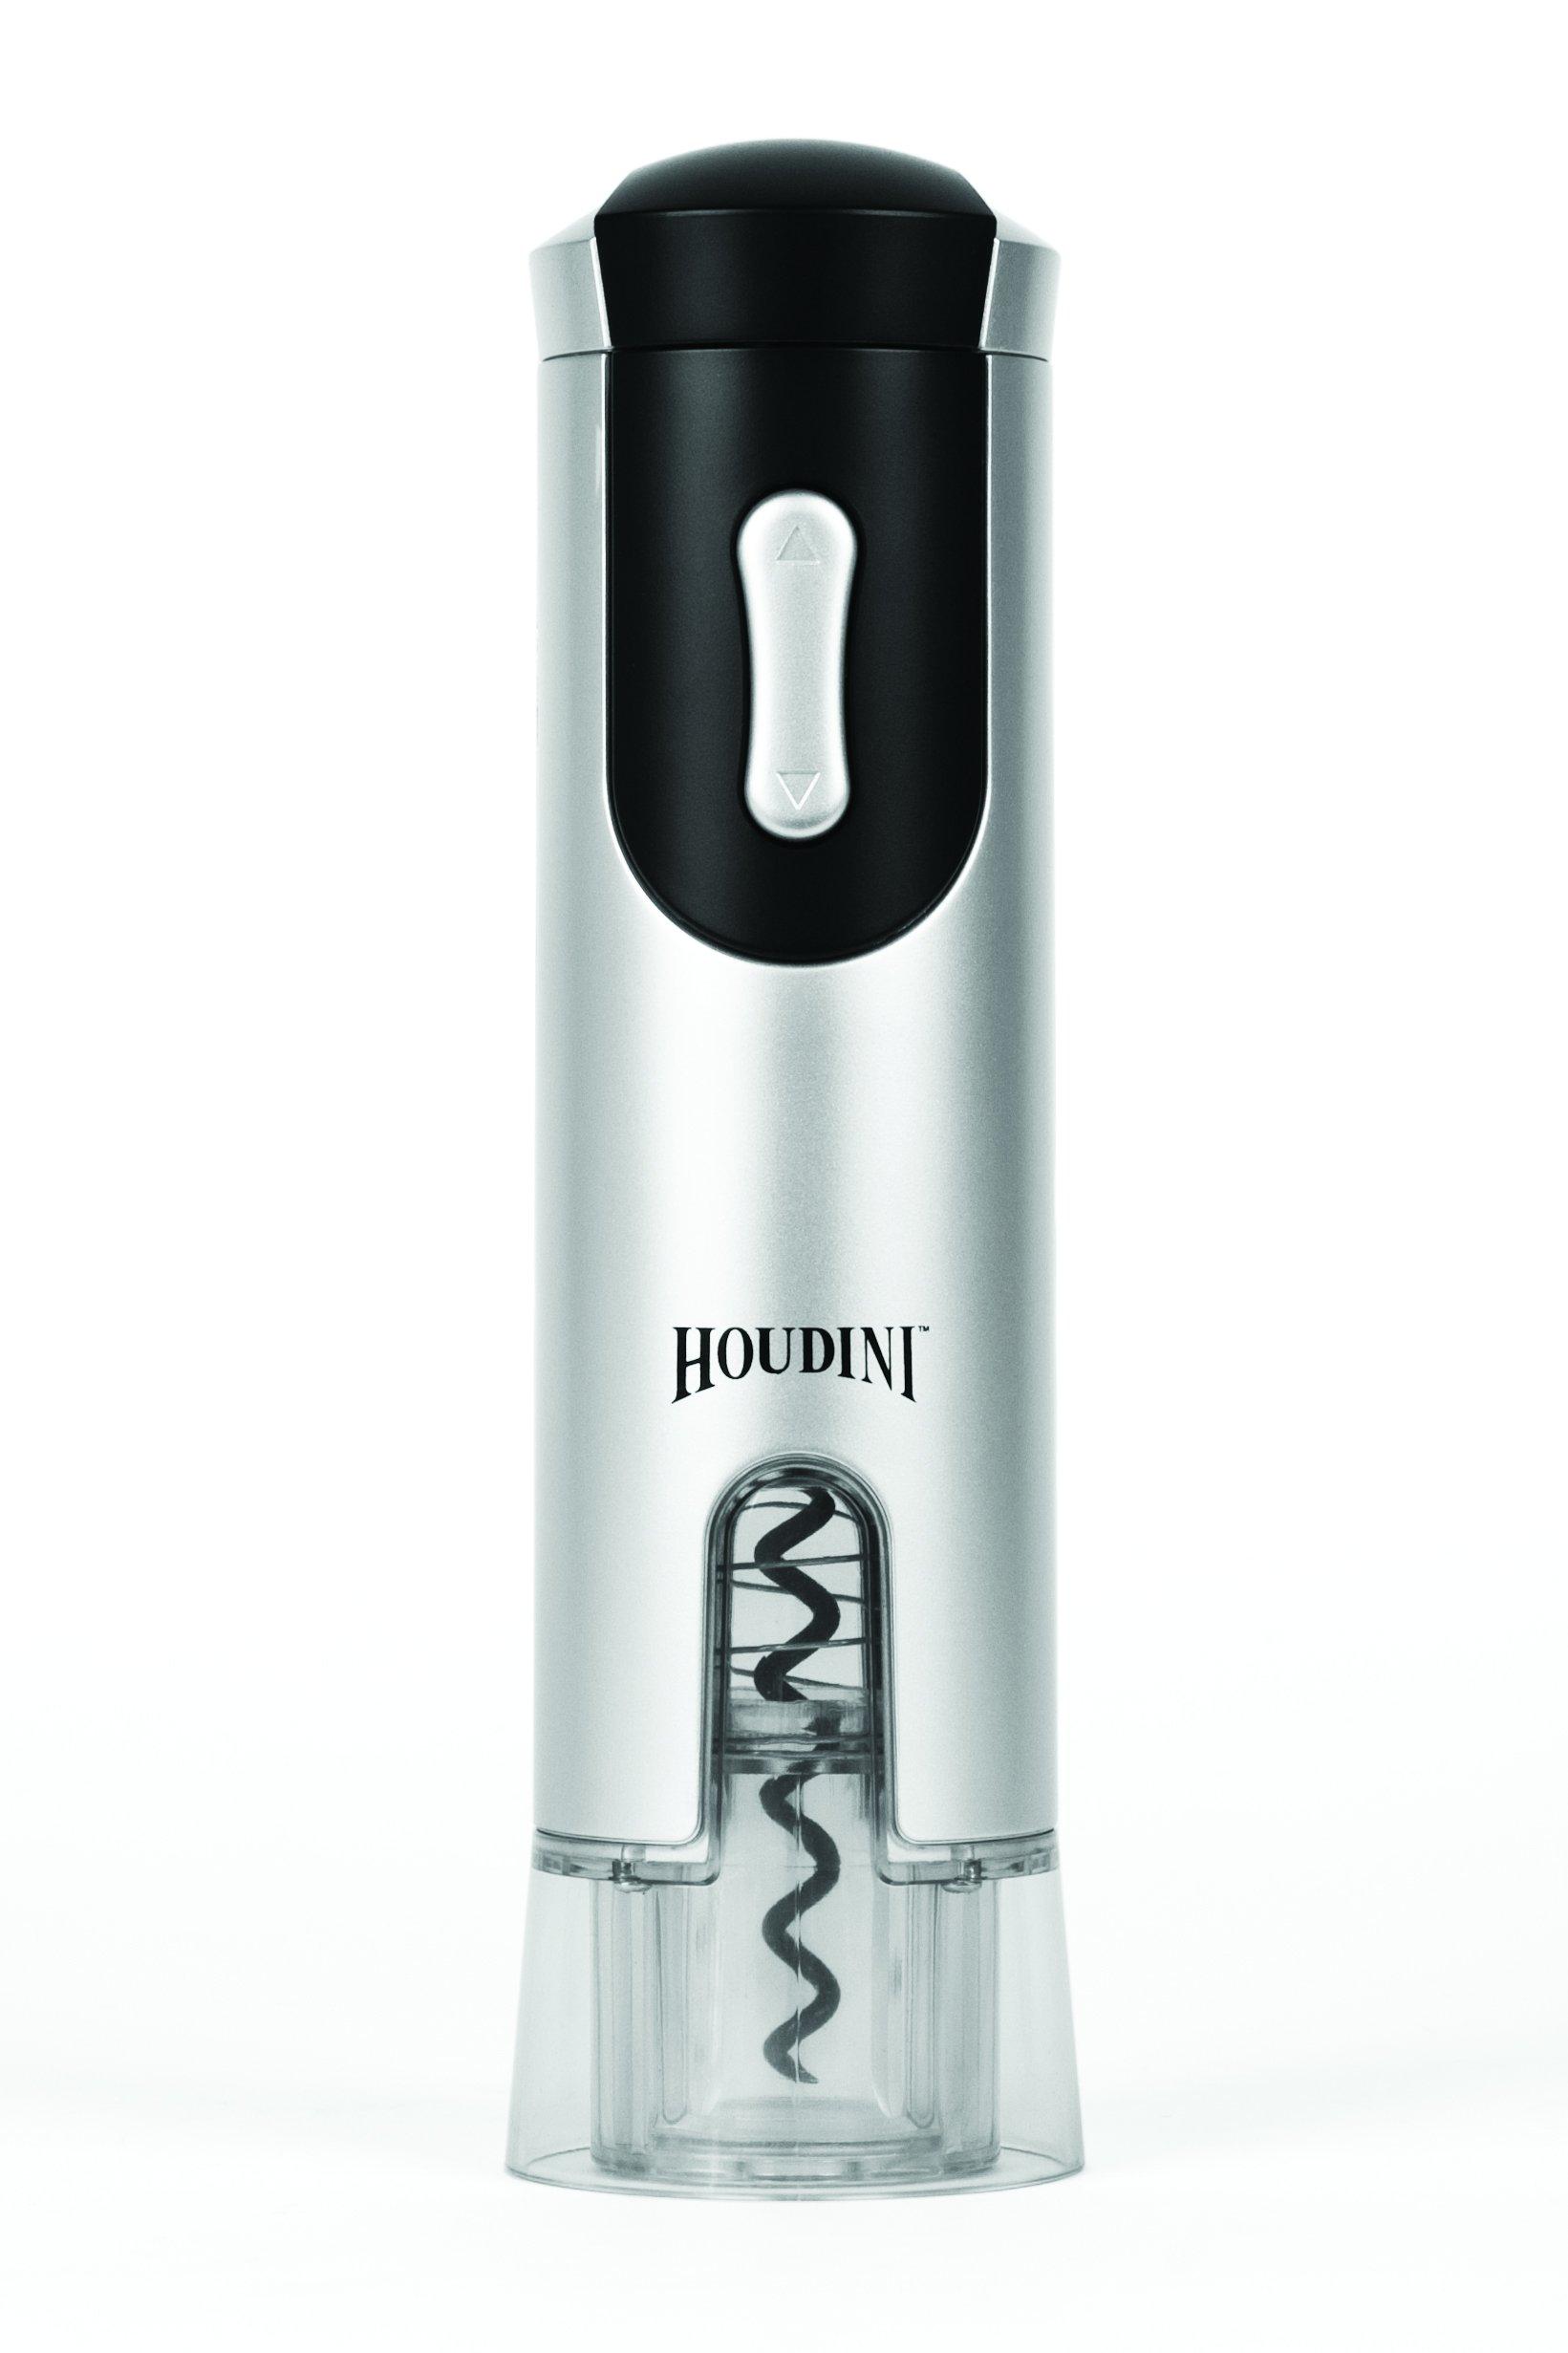 Metrokane Houdini Electric Corkscrew, Silver